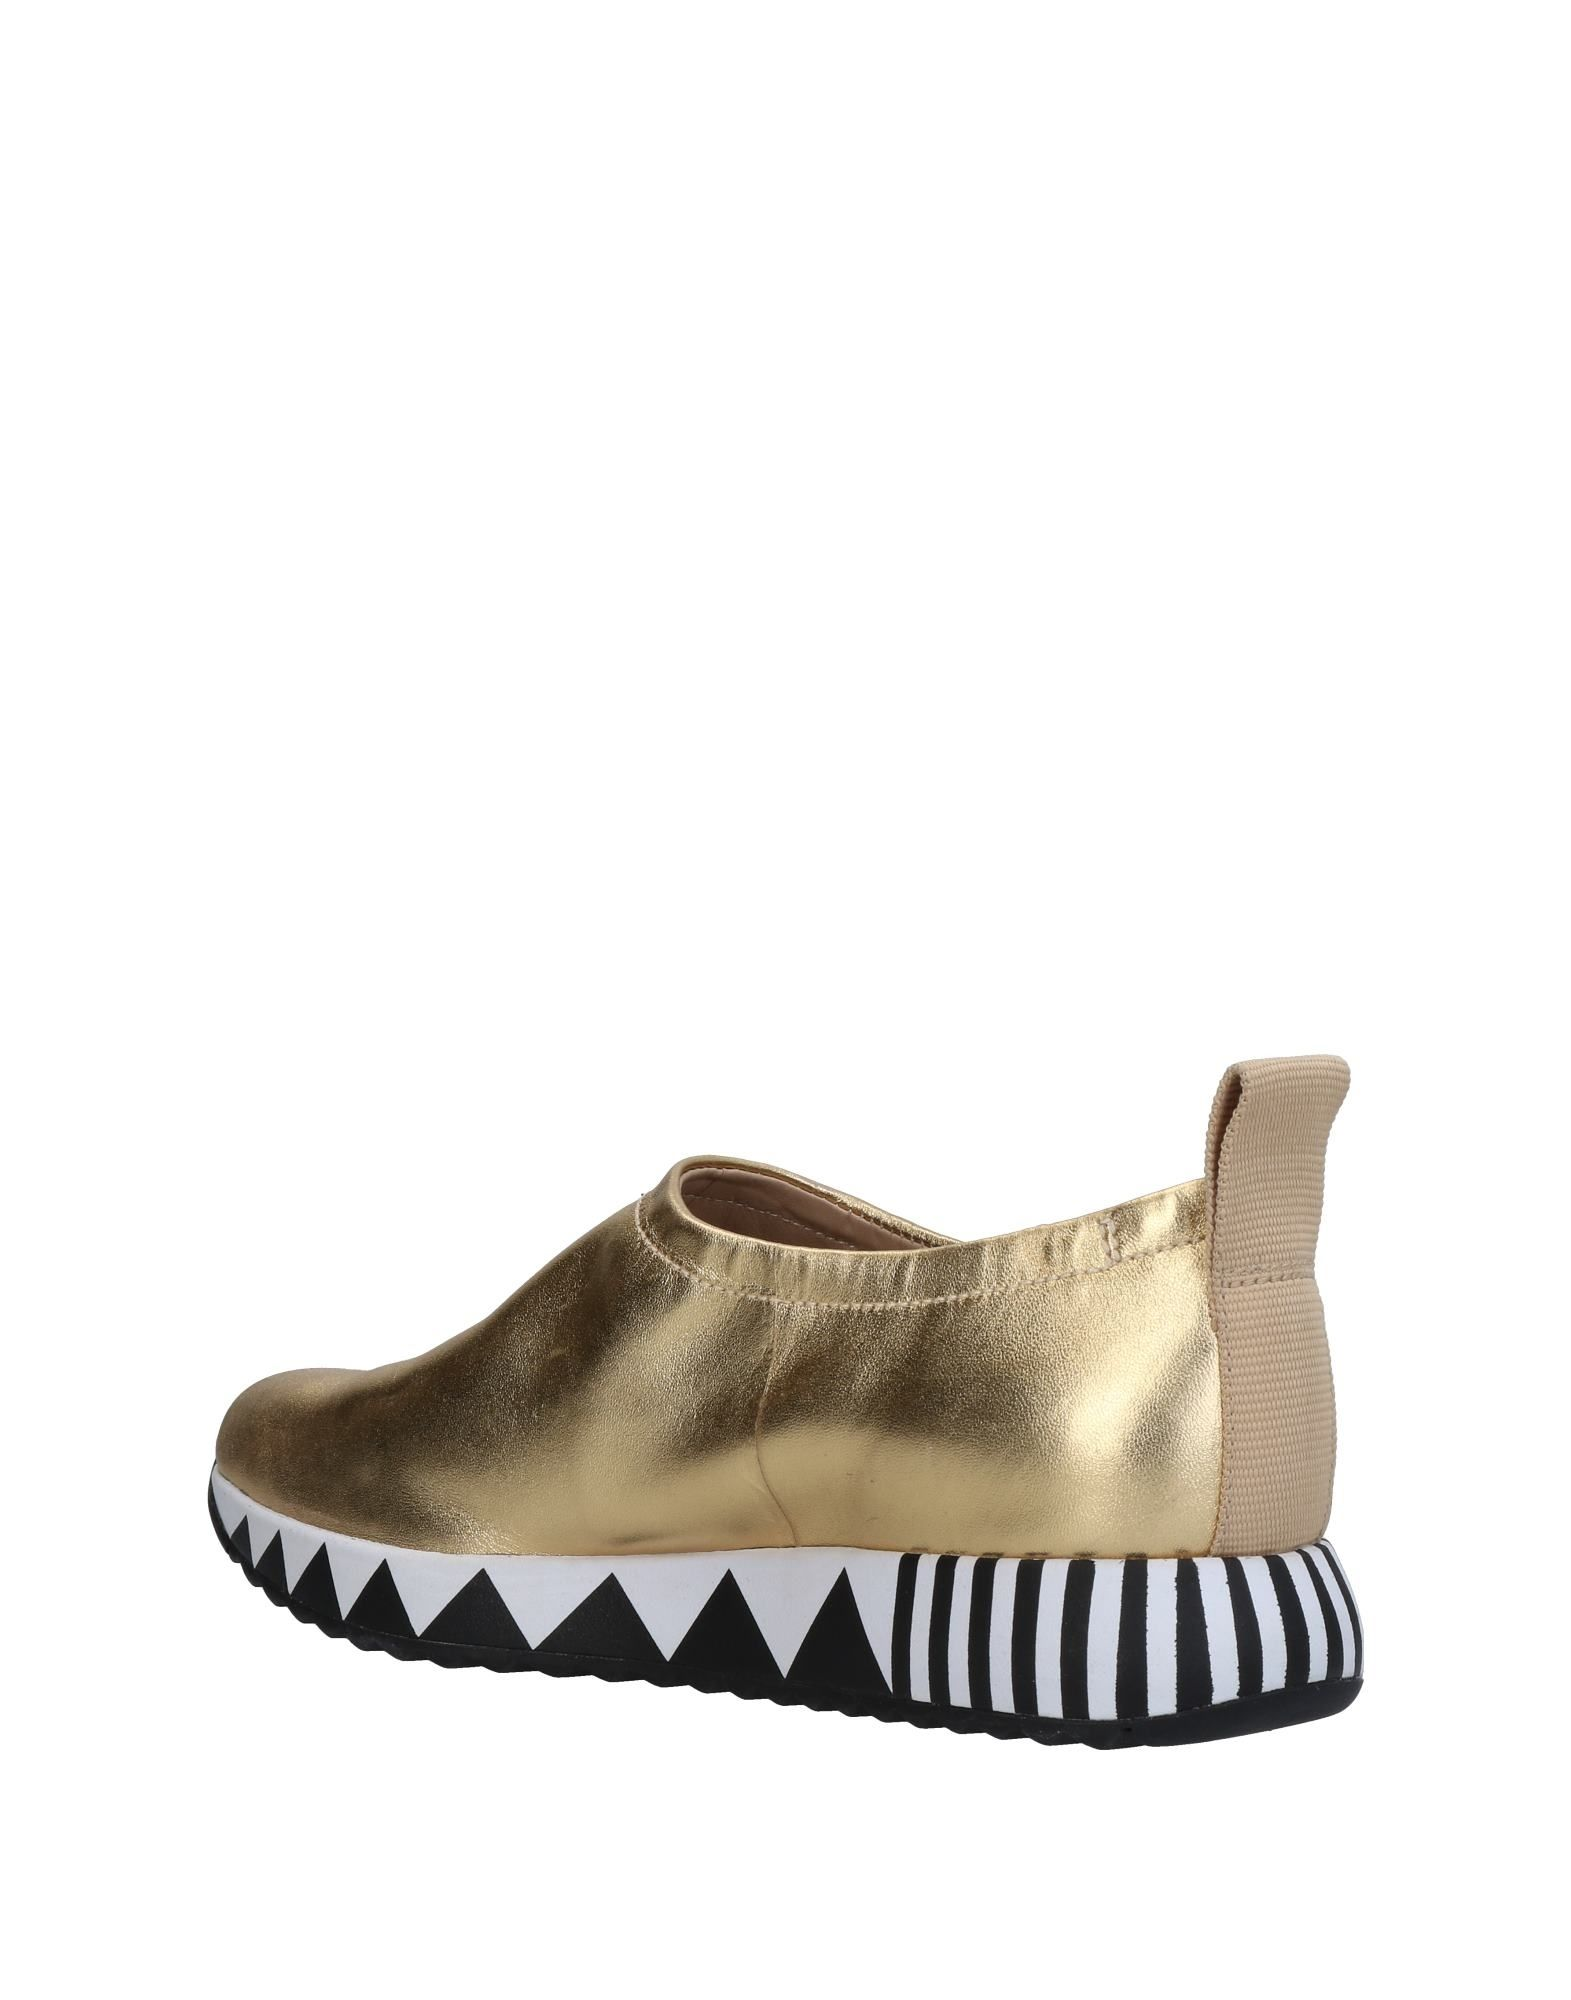 Sneakers Tory Burch Femme - Sneakers Tory Burch sur